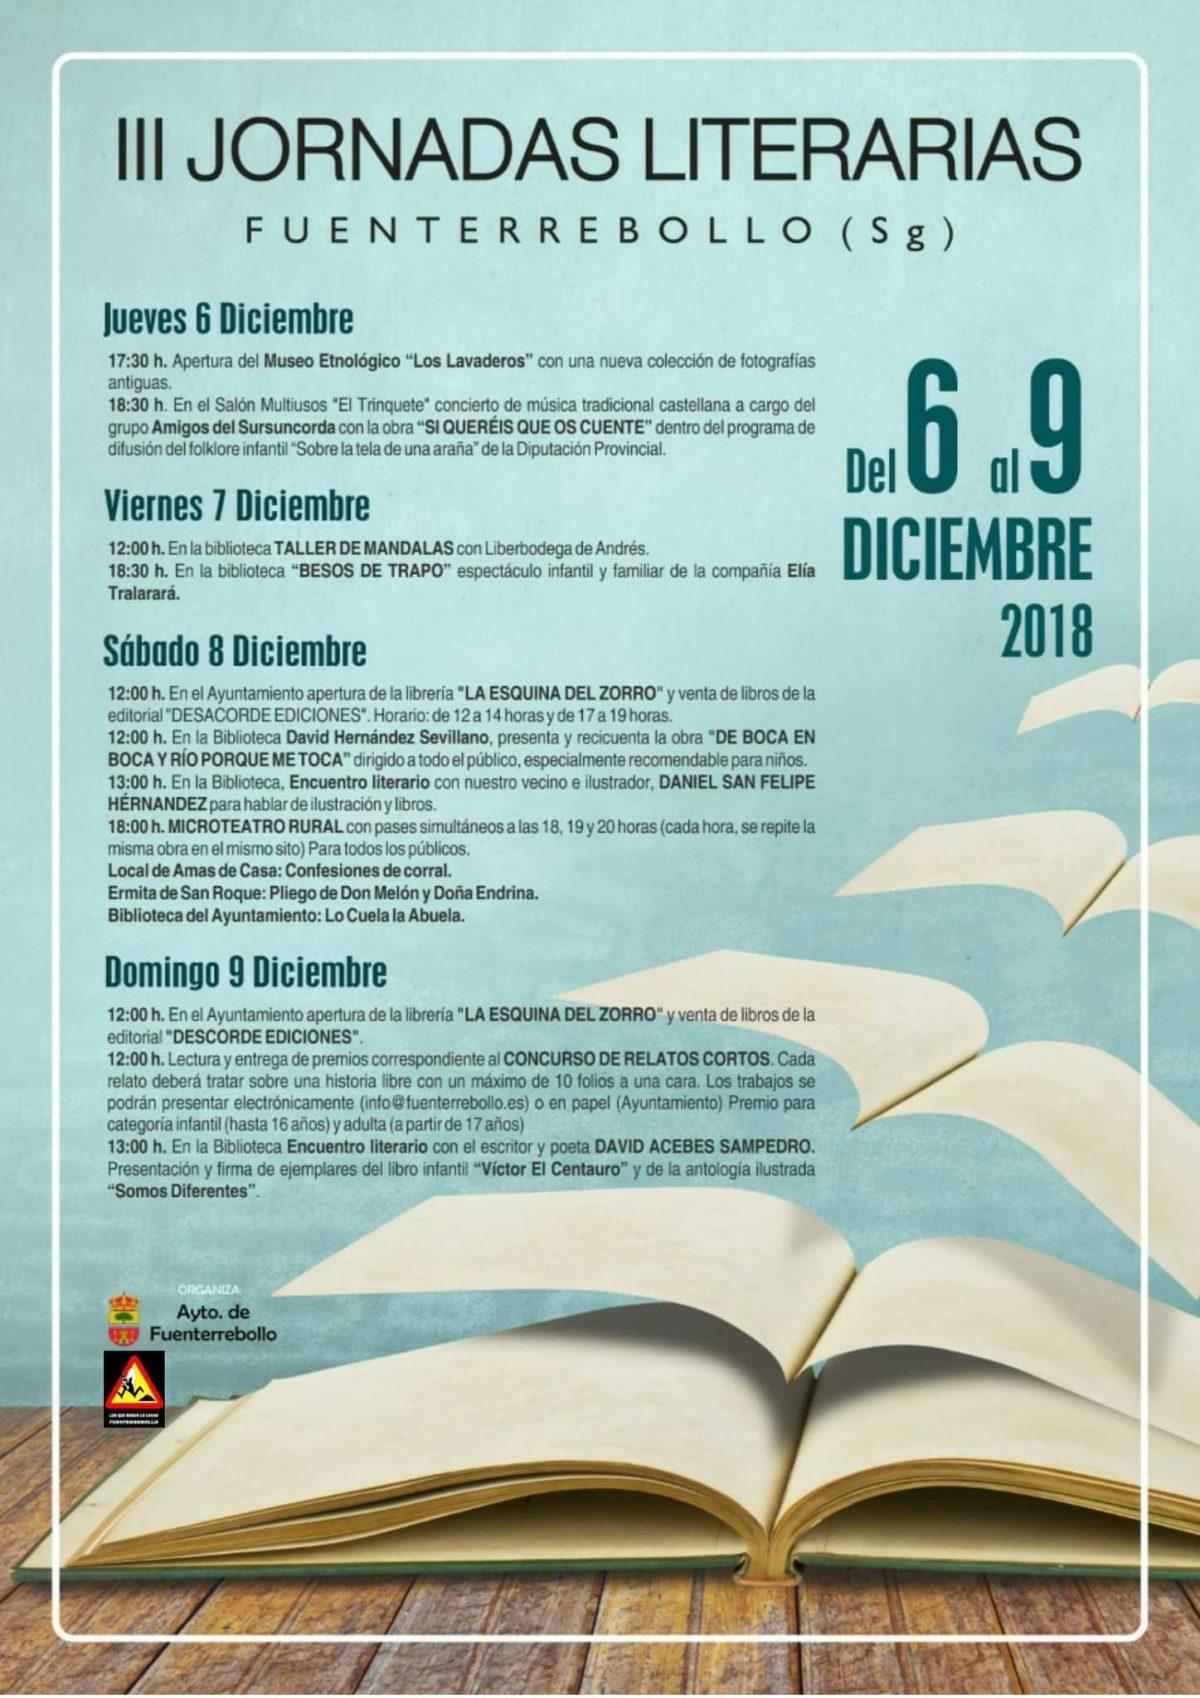 III Jornadas literarias. Fuenterrebollo 2018.